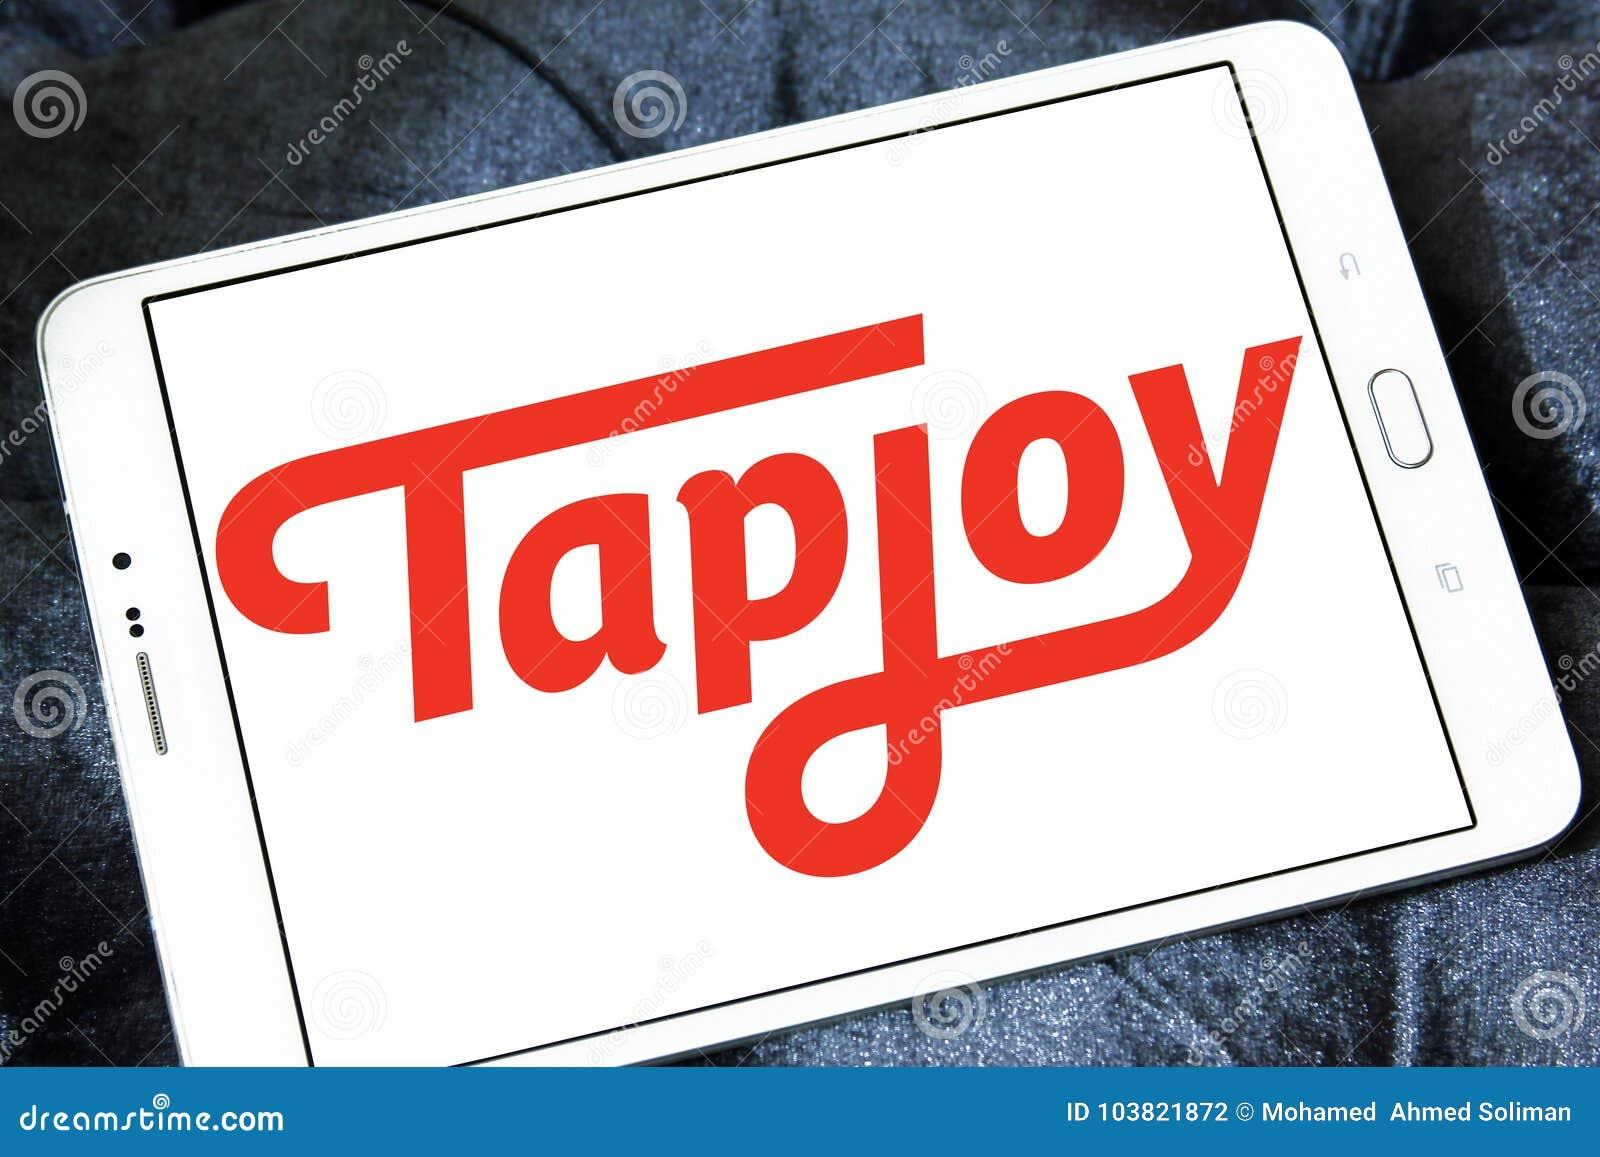 Tapjoy company logo editorial photography  Image of logotype